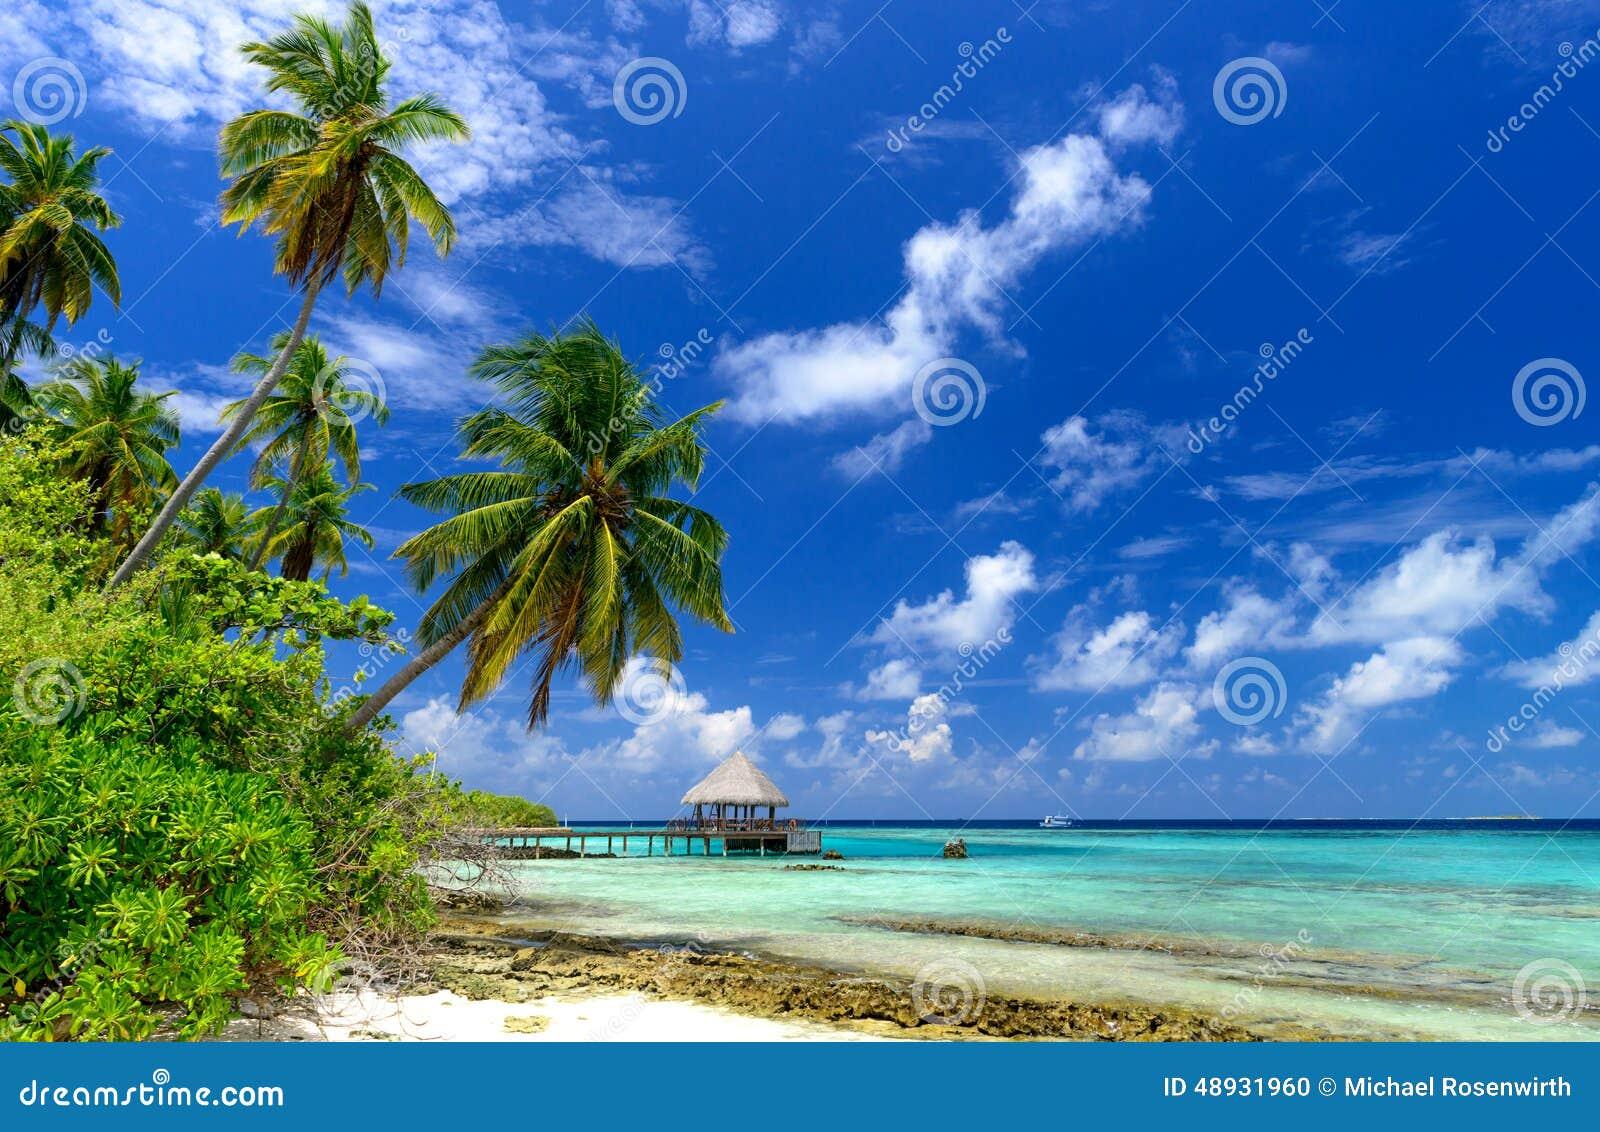 Tropical Island Beach Scenery: Tropical Beach Scenery Stock Photo